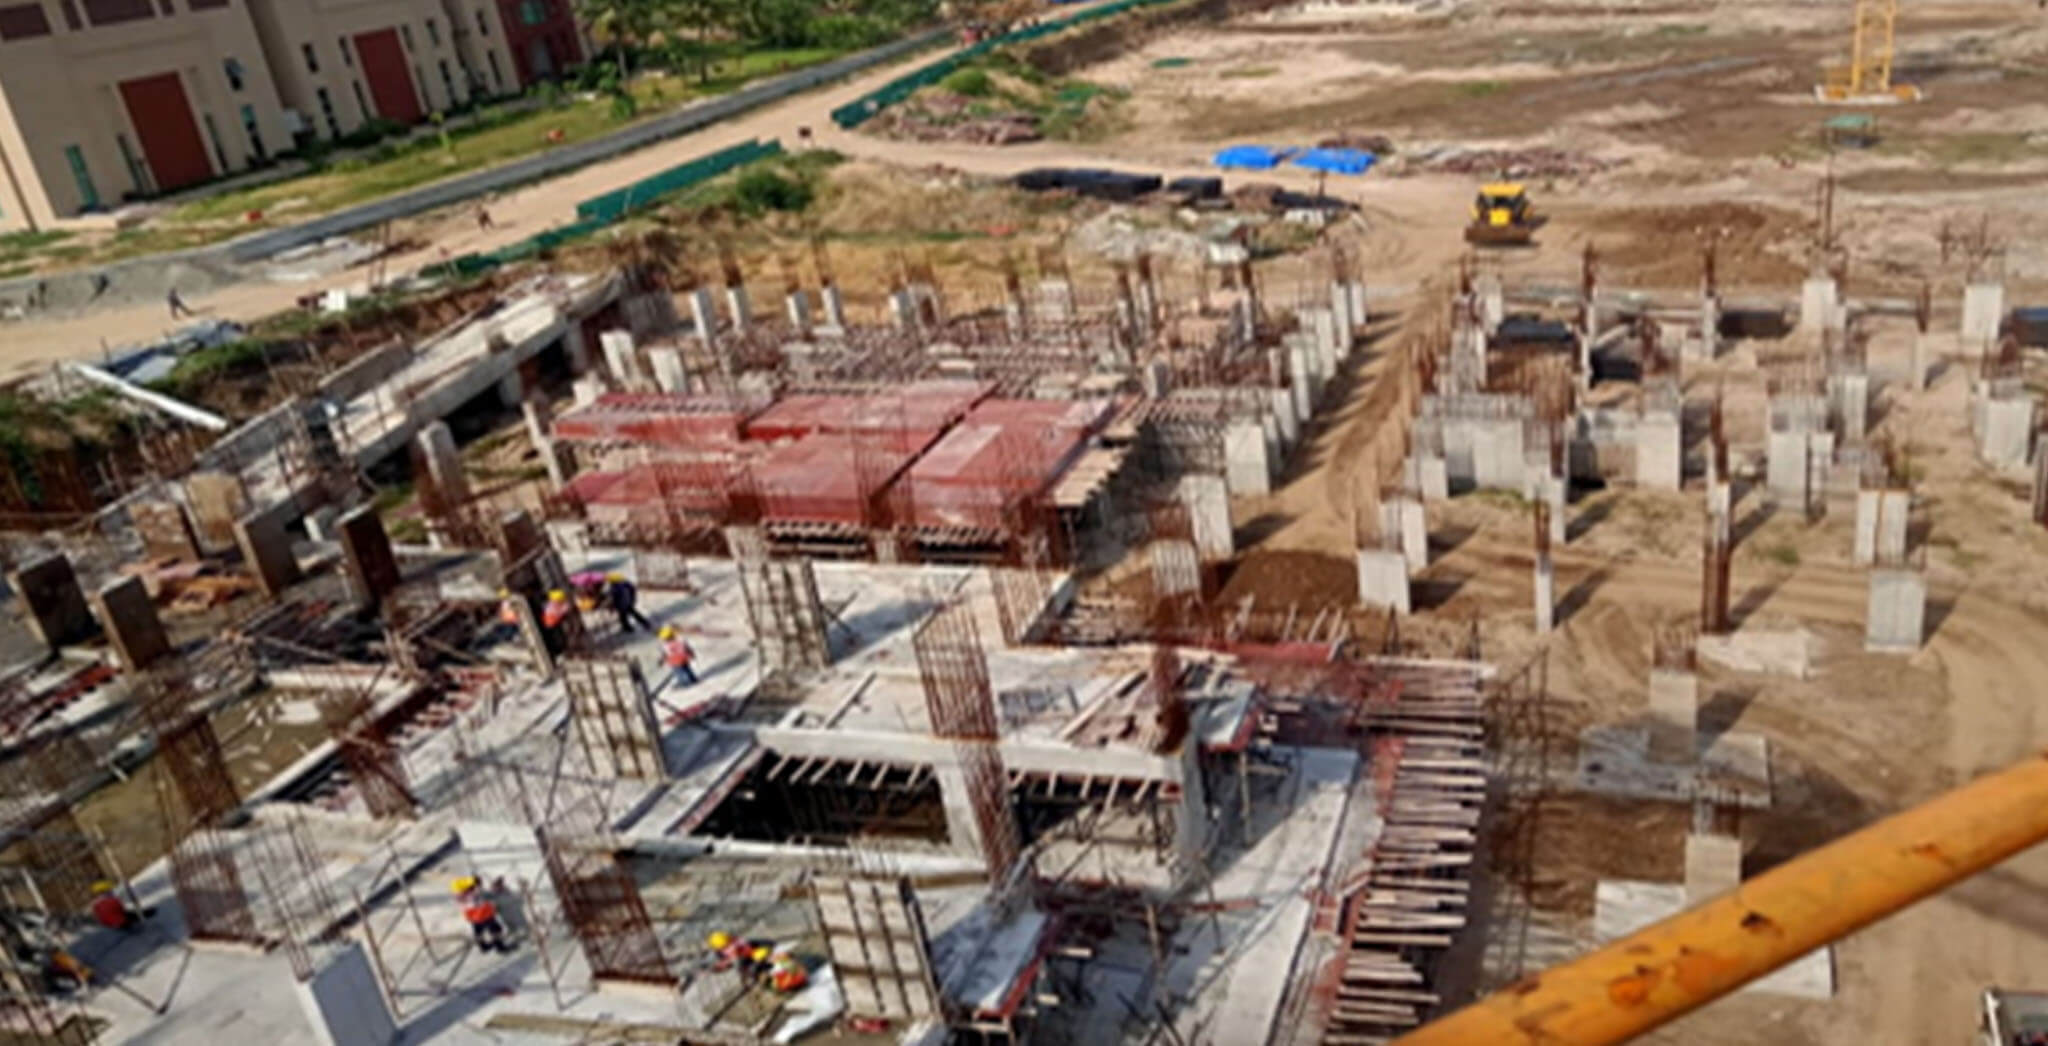 Jun 2021 - Block J: Excavation completed, foundational works completed, ground floor slab completed, first floor slab completed, second floor slab in progress